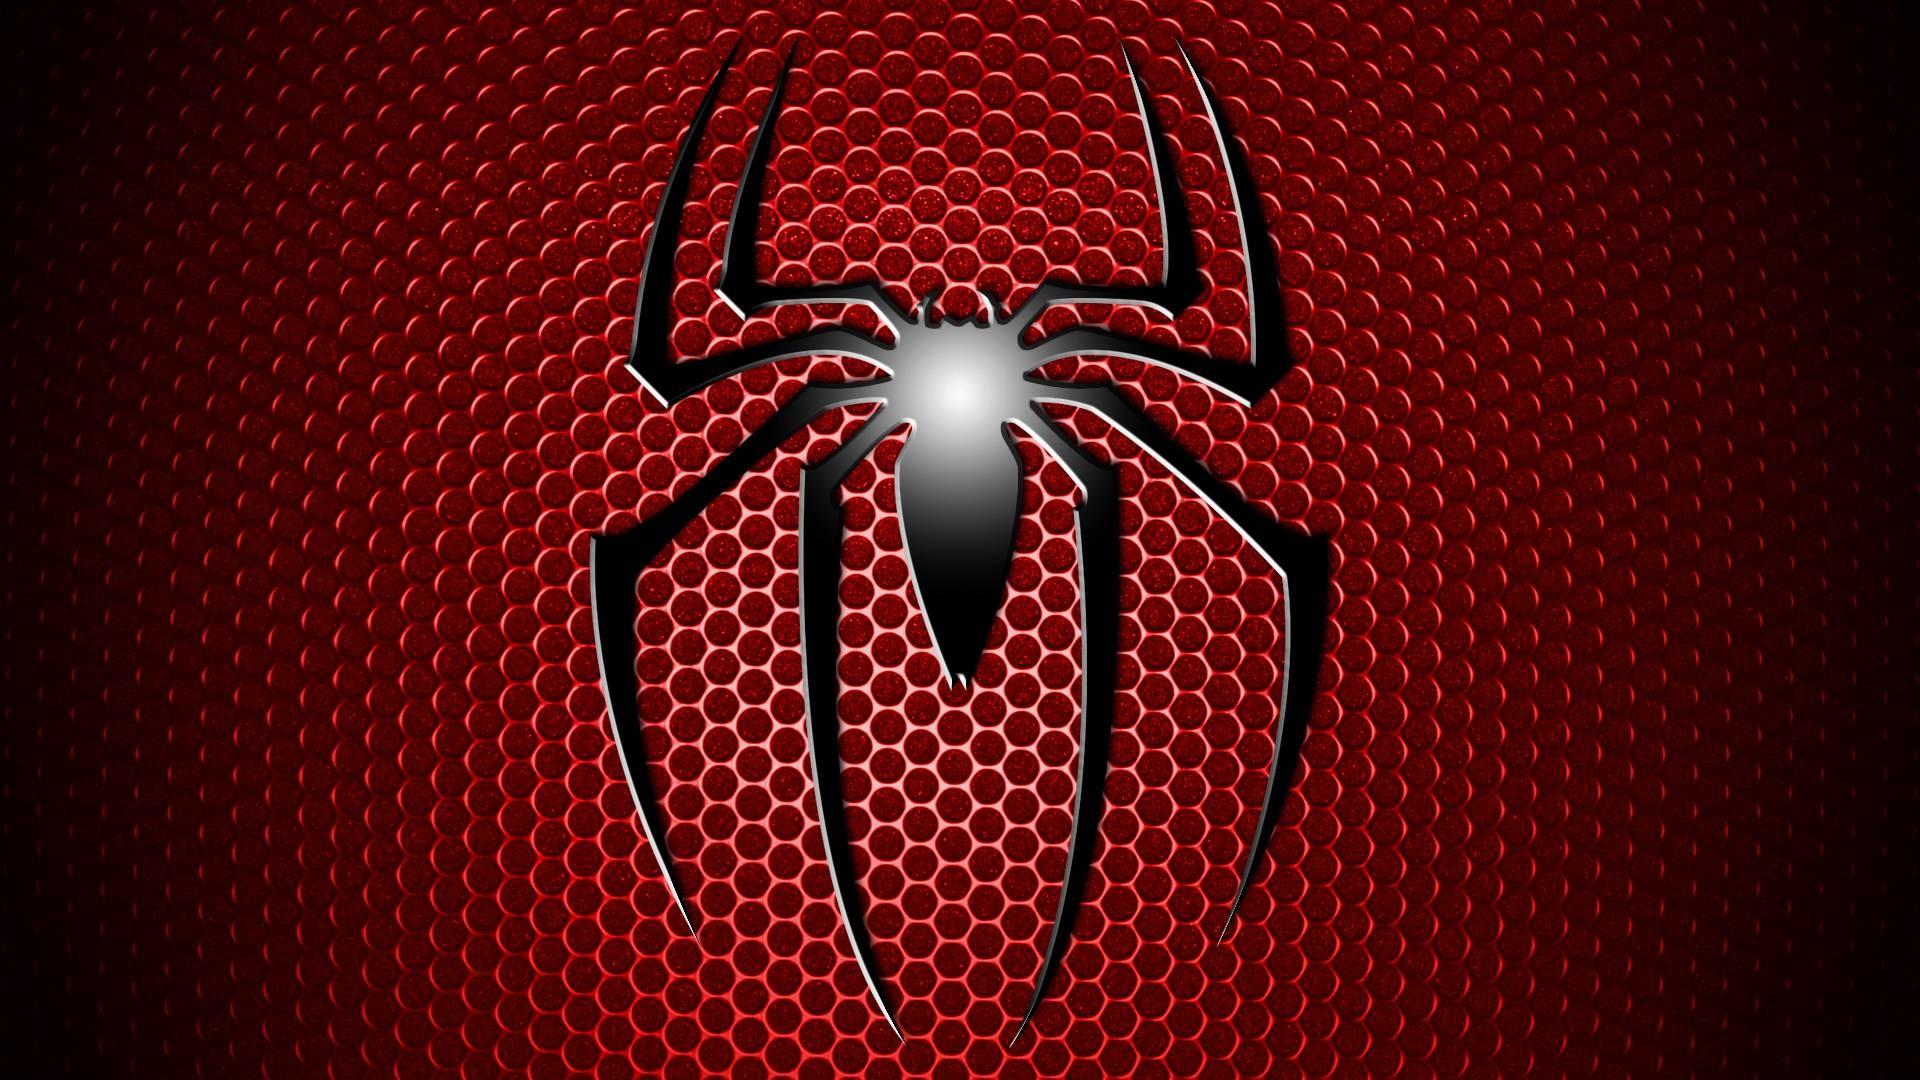 SpiderMan HD Wallpapers Wallpaper